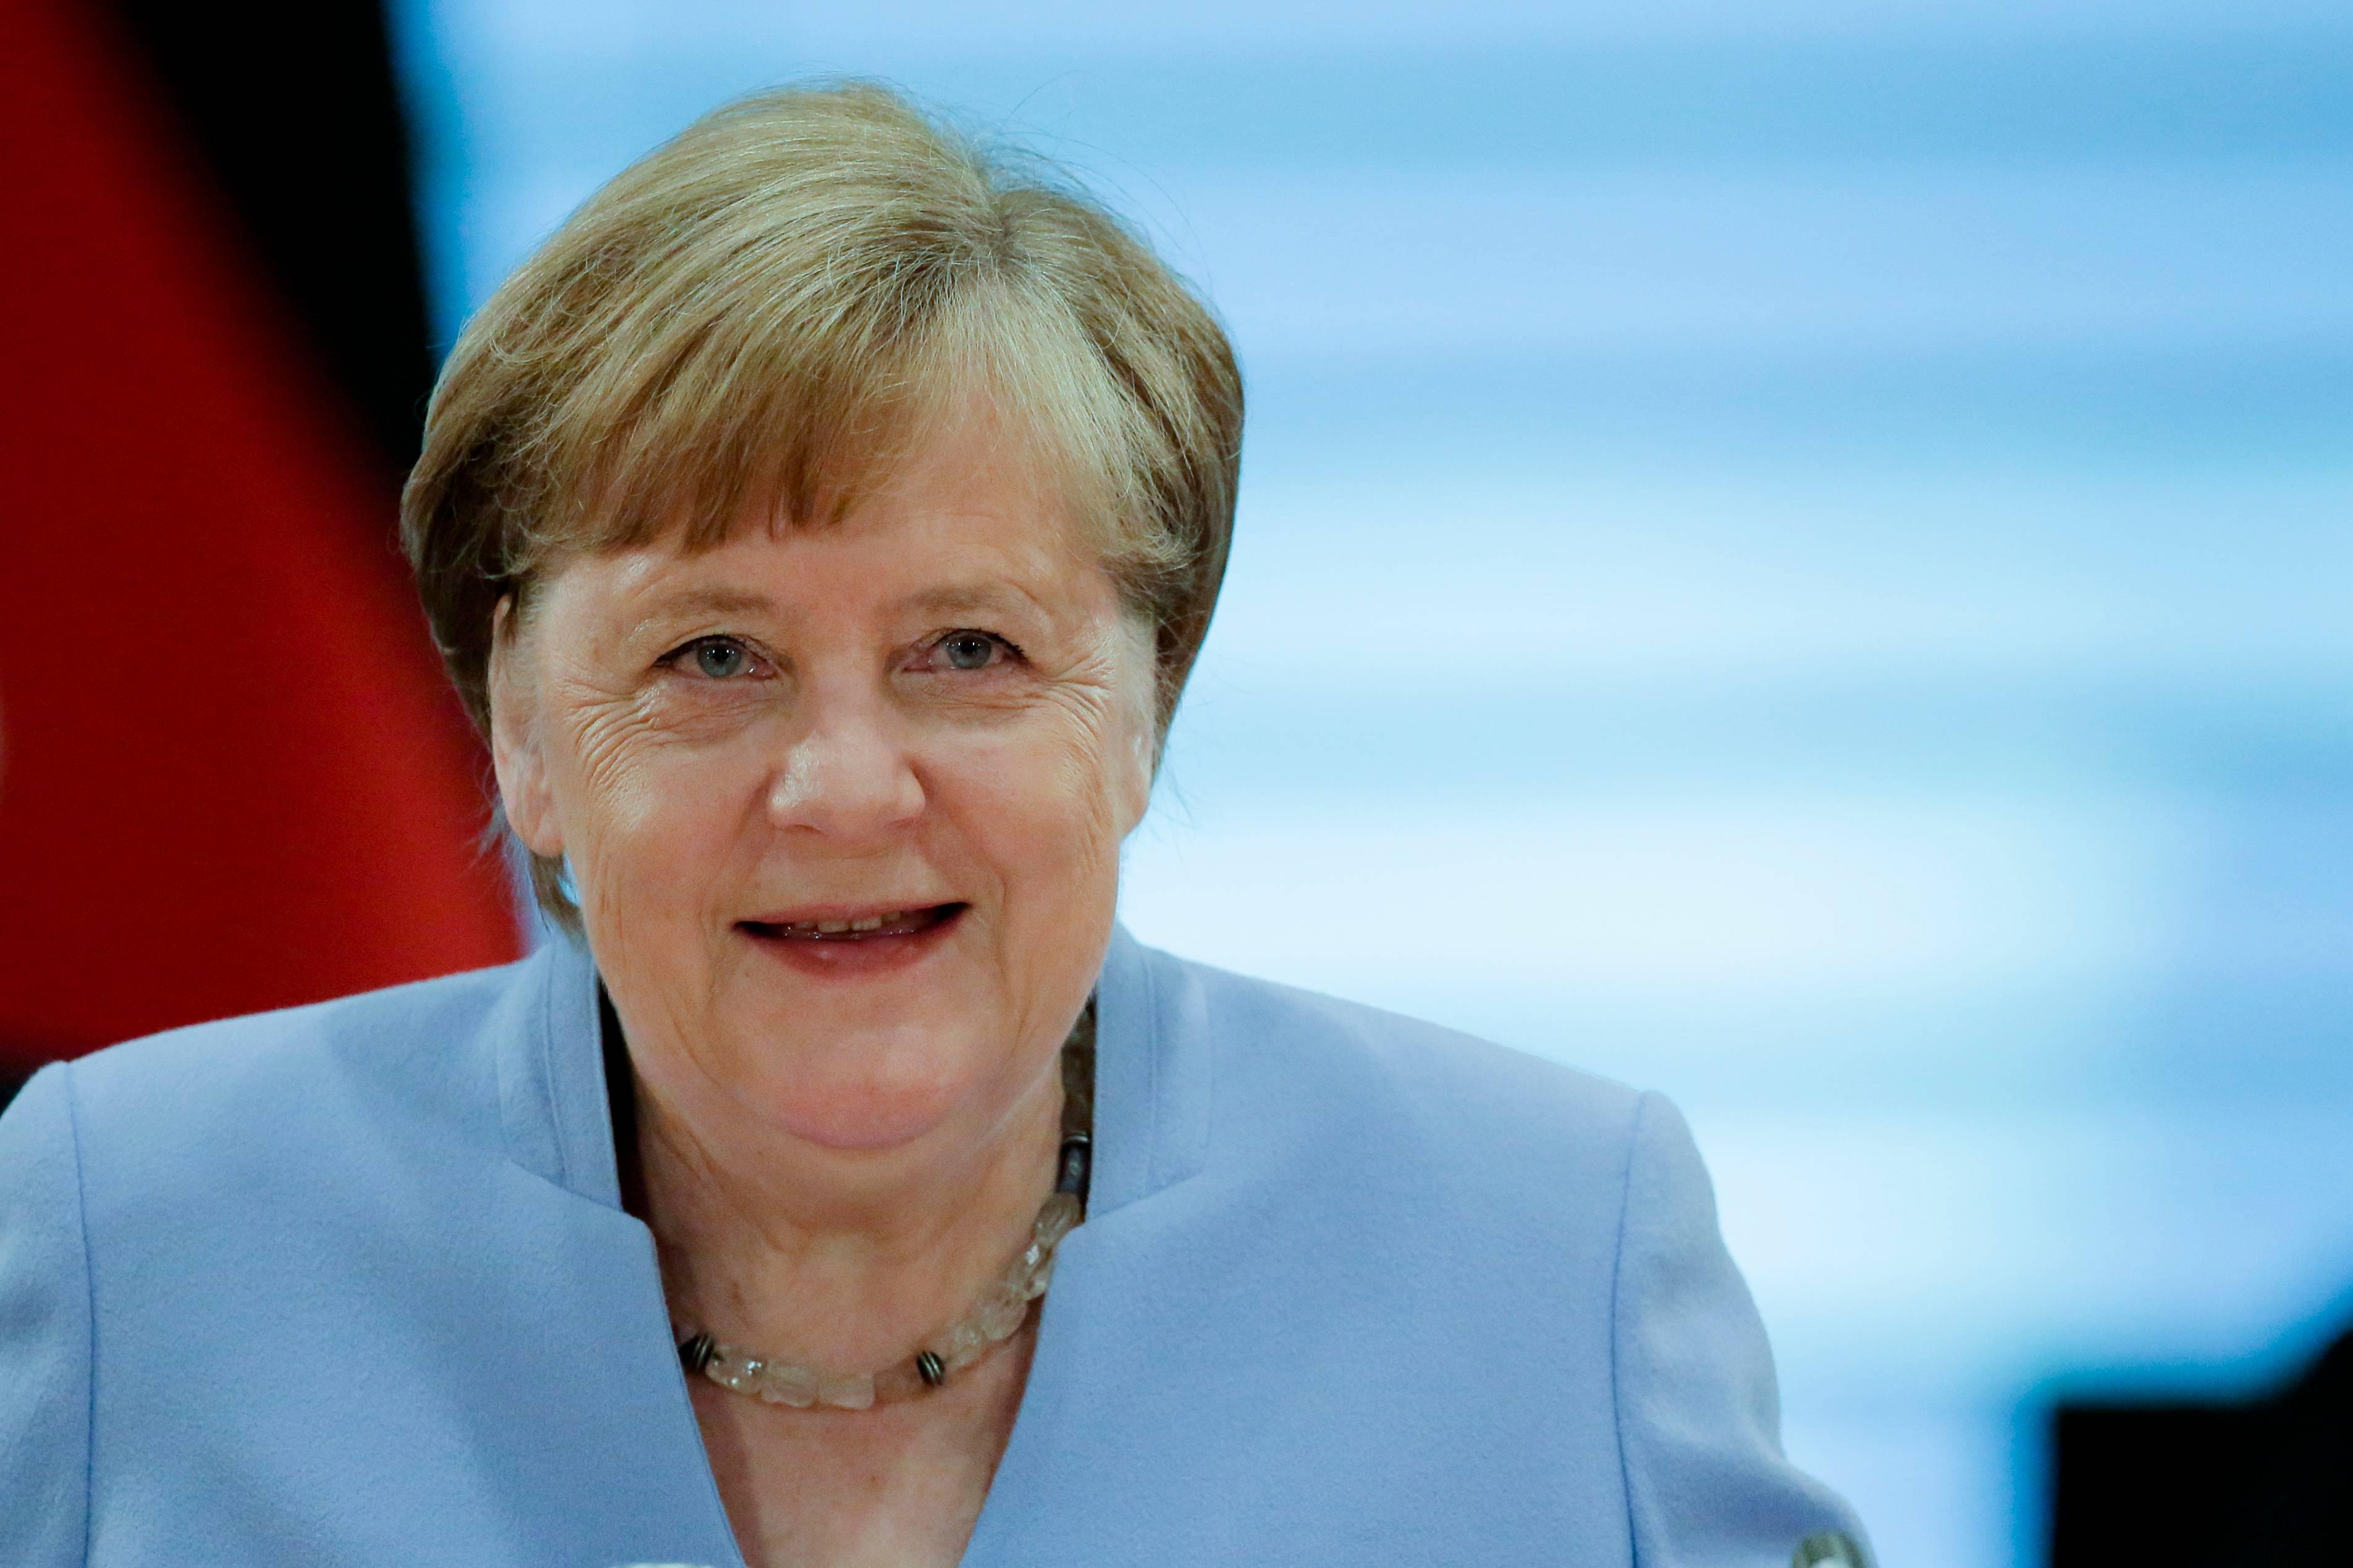 Chanceler Angela Merkel   FOTO: Markus Schreiber / POOL / AFP